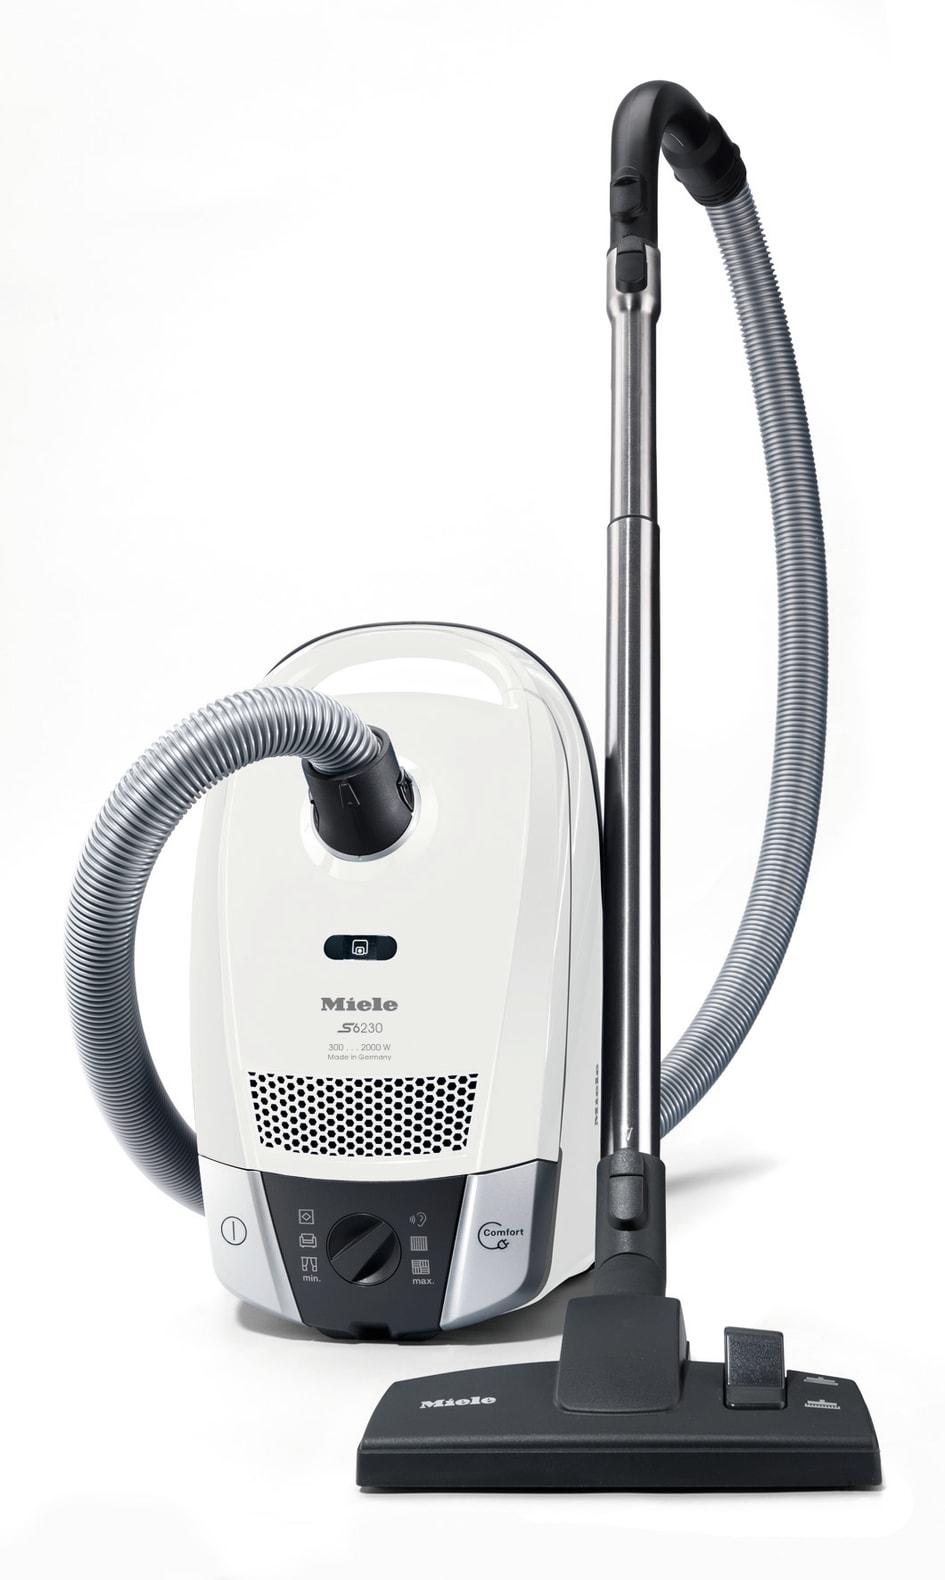 Omtalade Miele S6: Nya kompakta, energieffektiva och tysta dammsugare - Miele SV-99